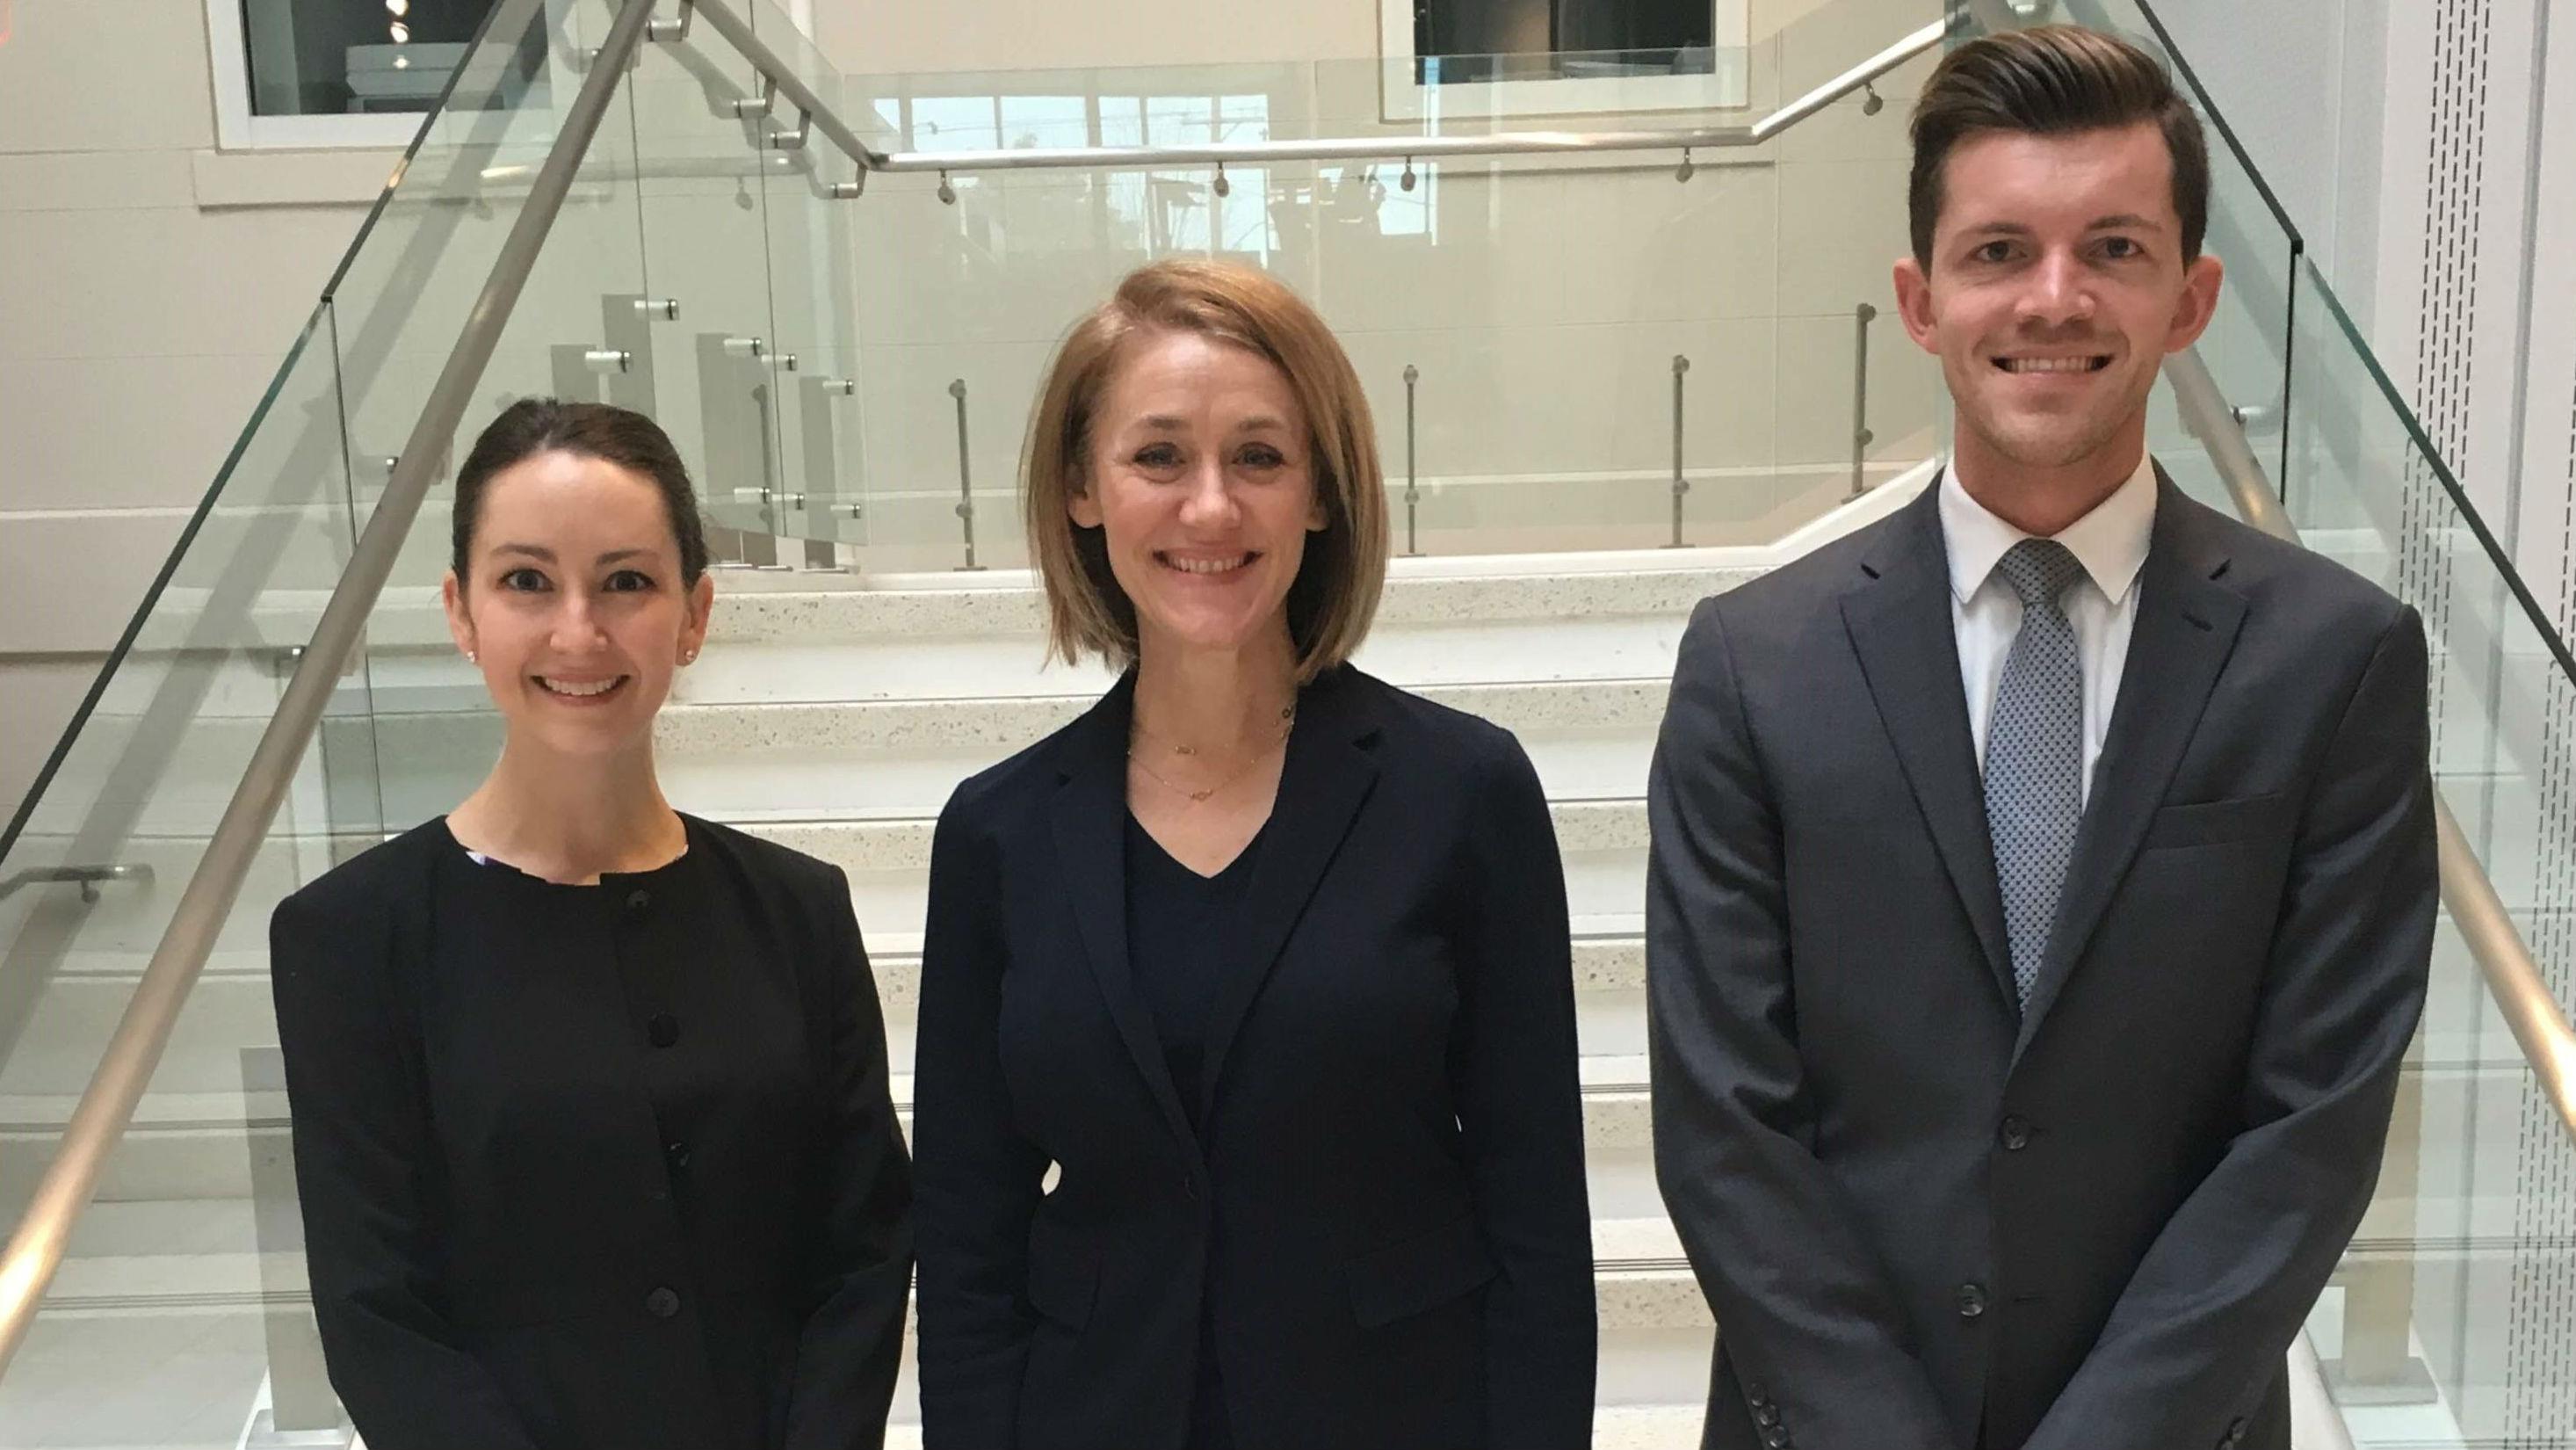 Students Lauren Mattioni and Elliot LaParne Win the International Trademark Association's Mid-Atlantic Regional Moot Court Competition